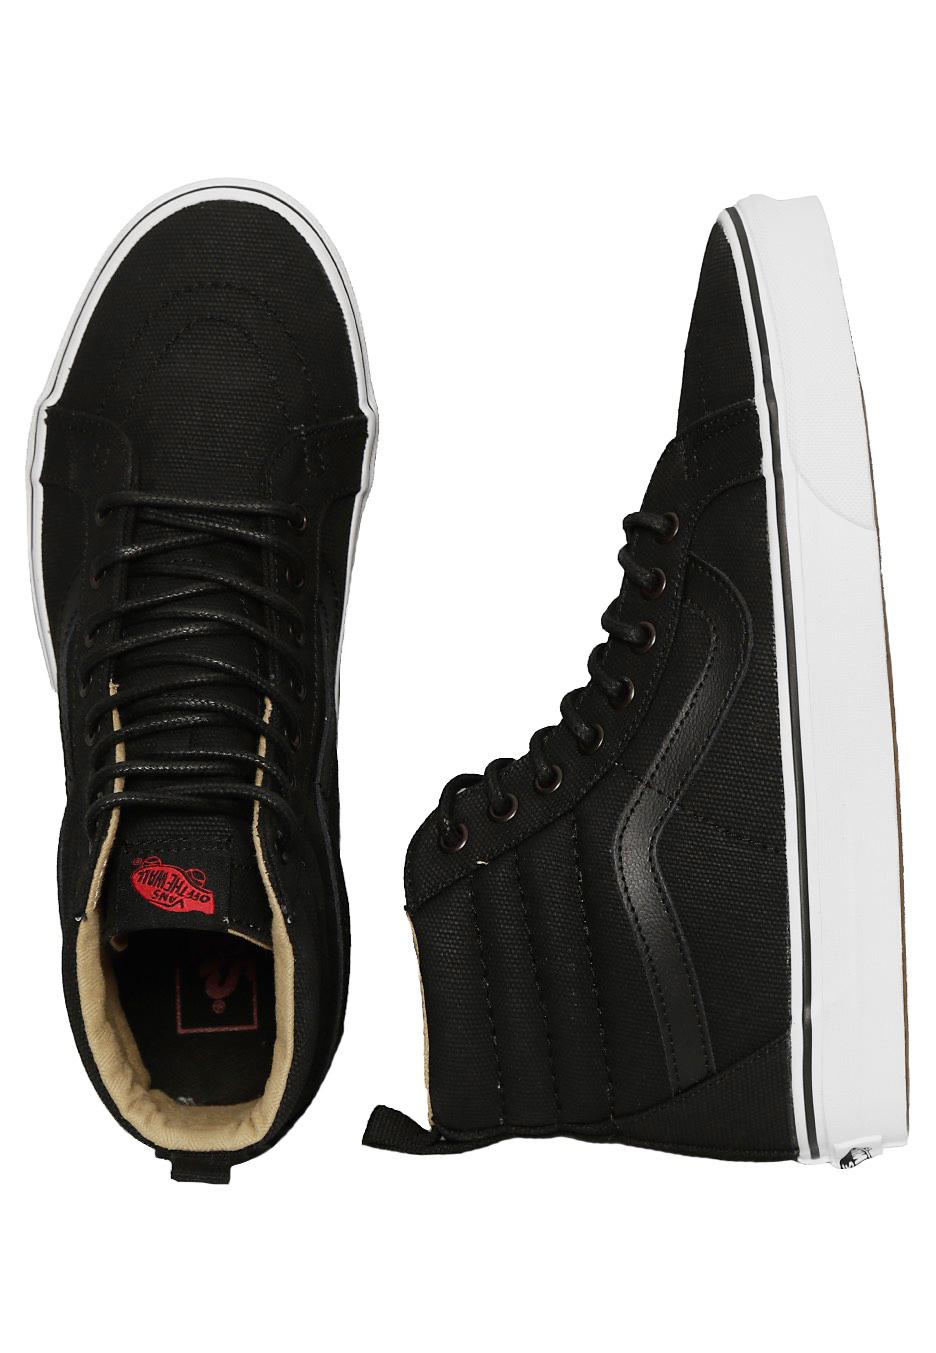 297aebd5b4 Vans - Sk8-Hi Reissue PT Military Twill Black True White - Shoes -  Impericon.com UK